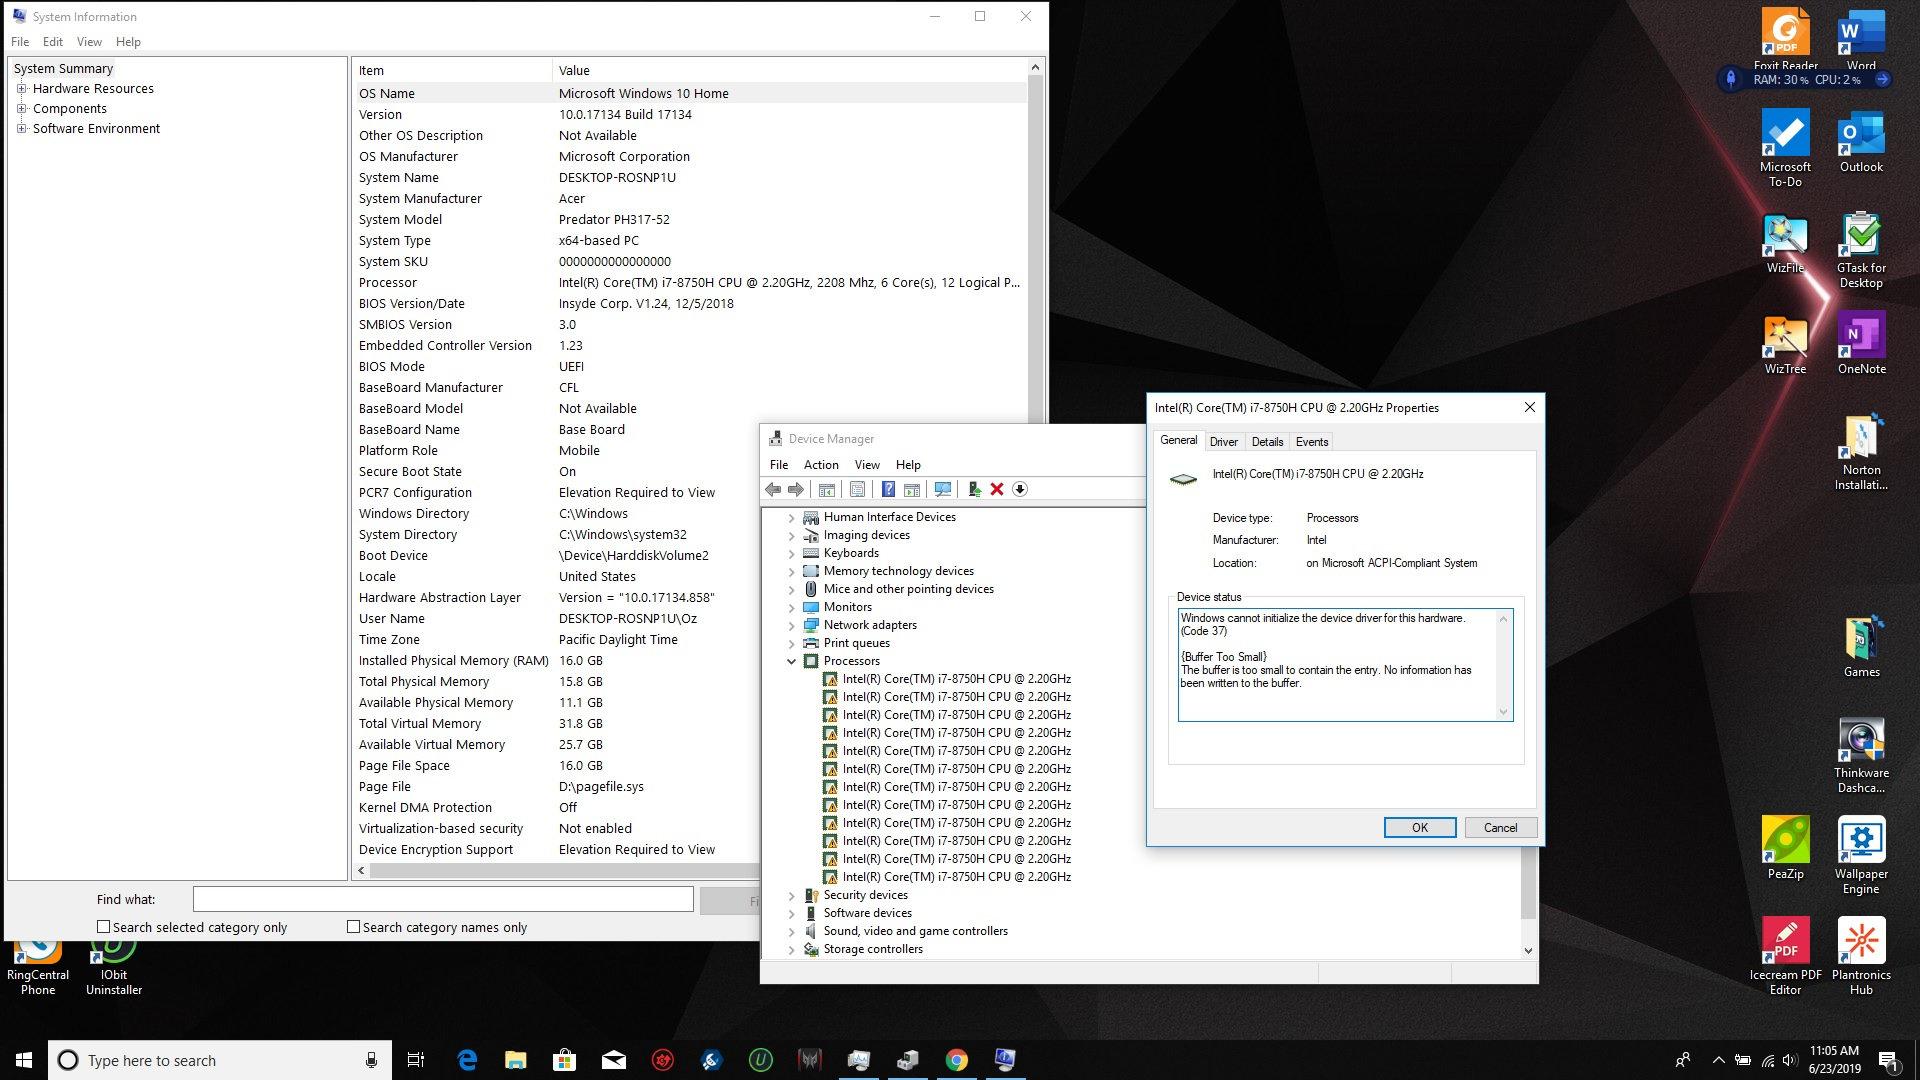 Acer Predator Helios 300 Ph317 52 Device Manager Error Code 37 On I7 Cpu Acer Community